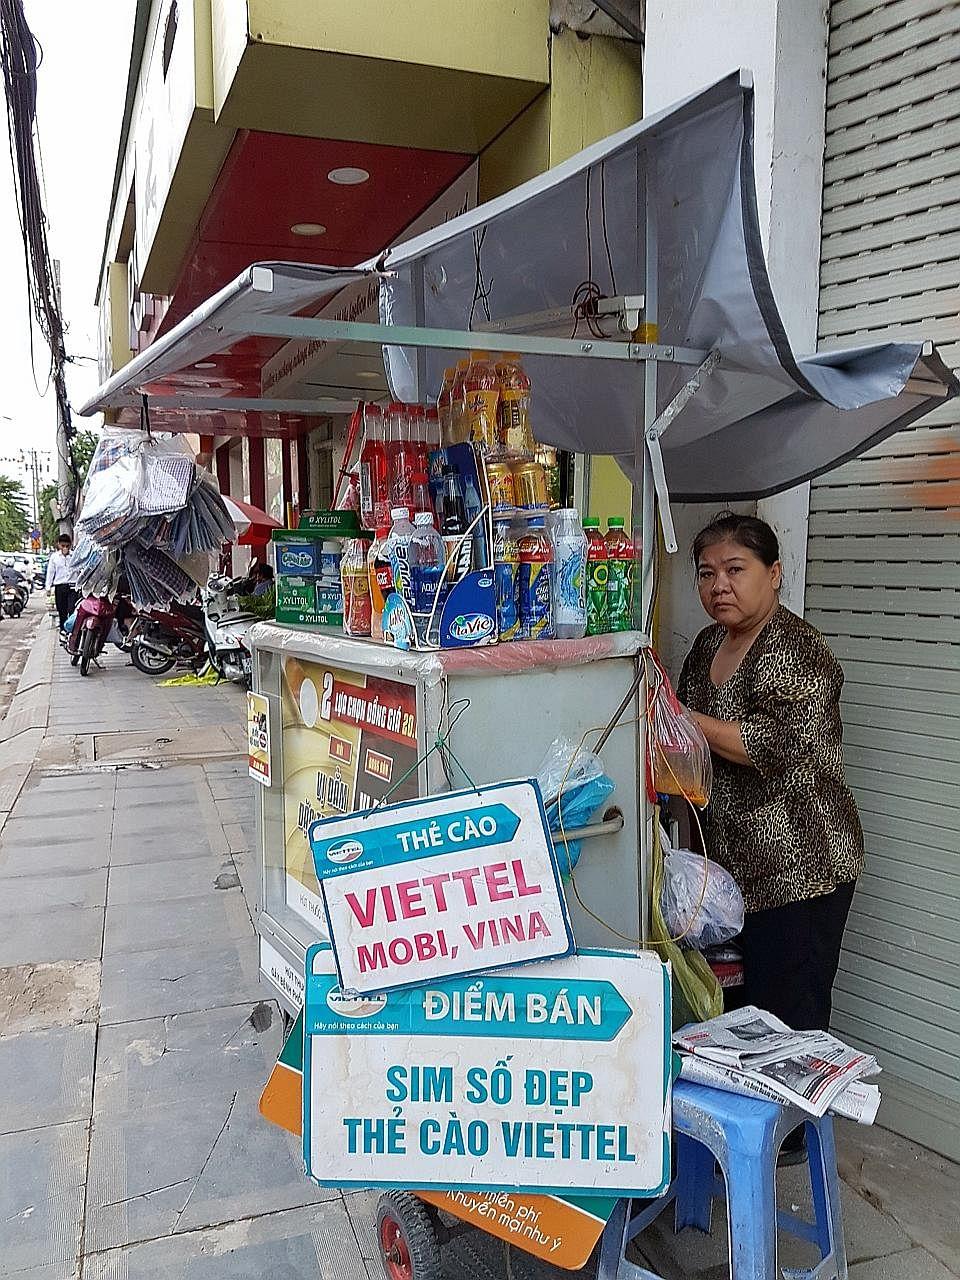 Regional govts clamp down on prepaid SIM cards, SE Asia News & Top